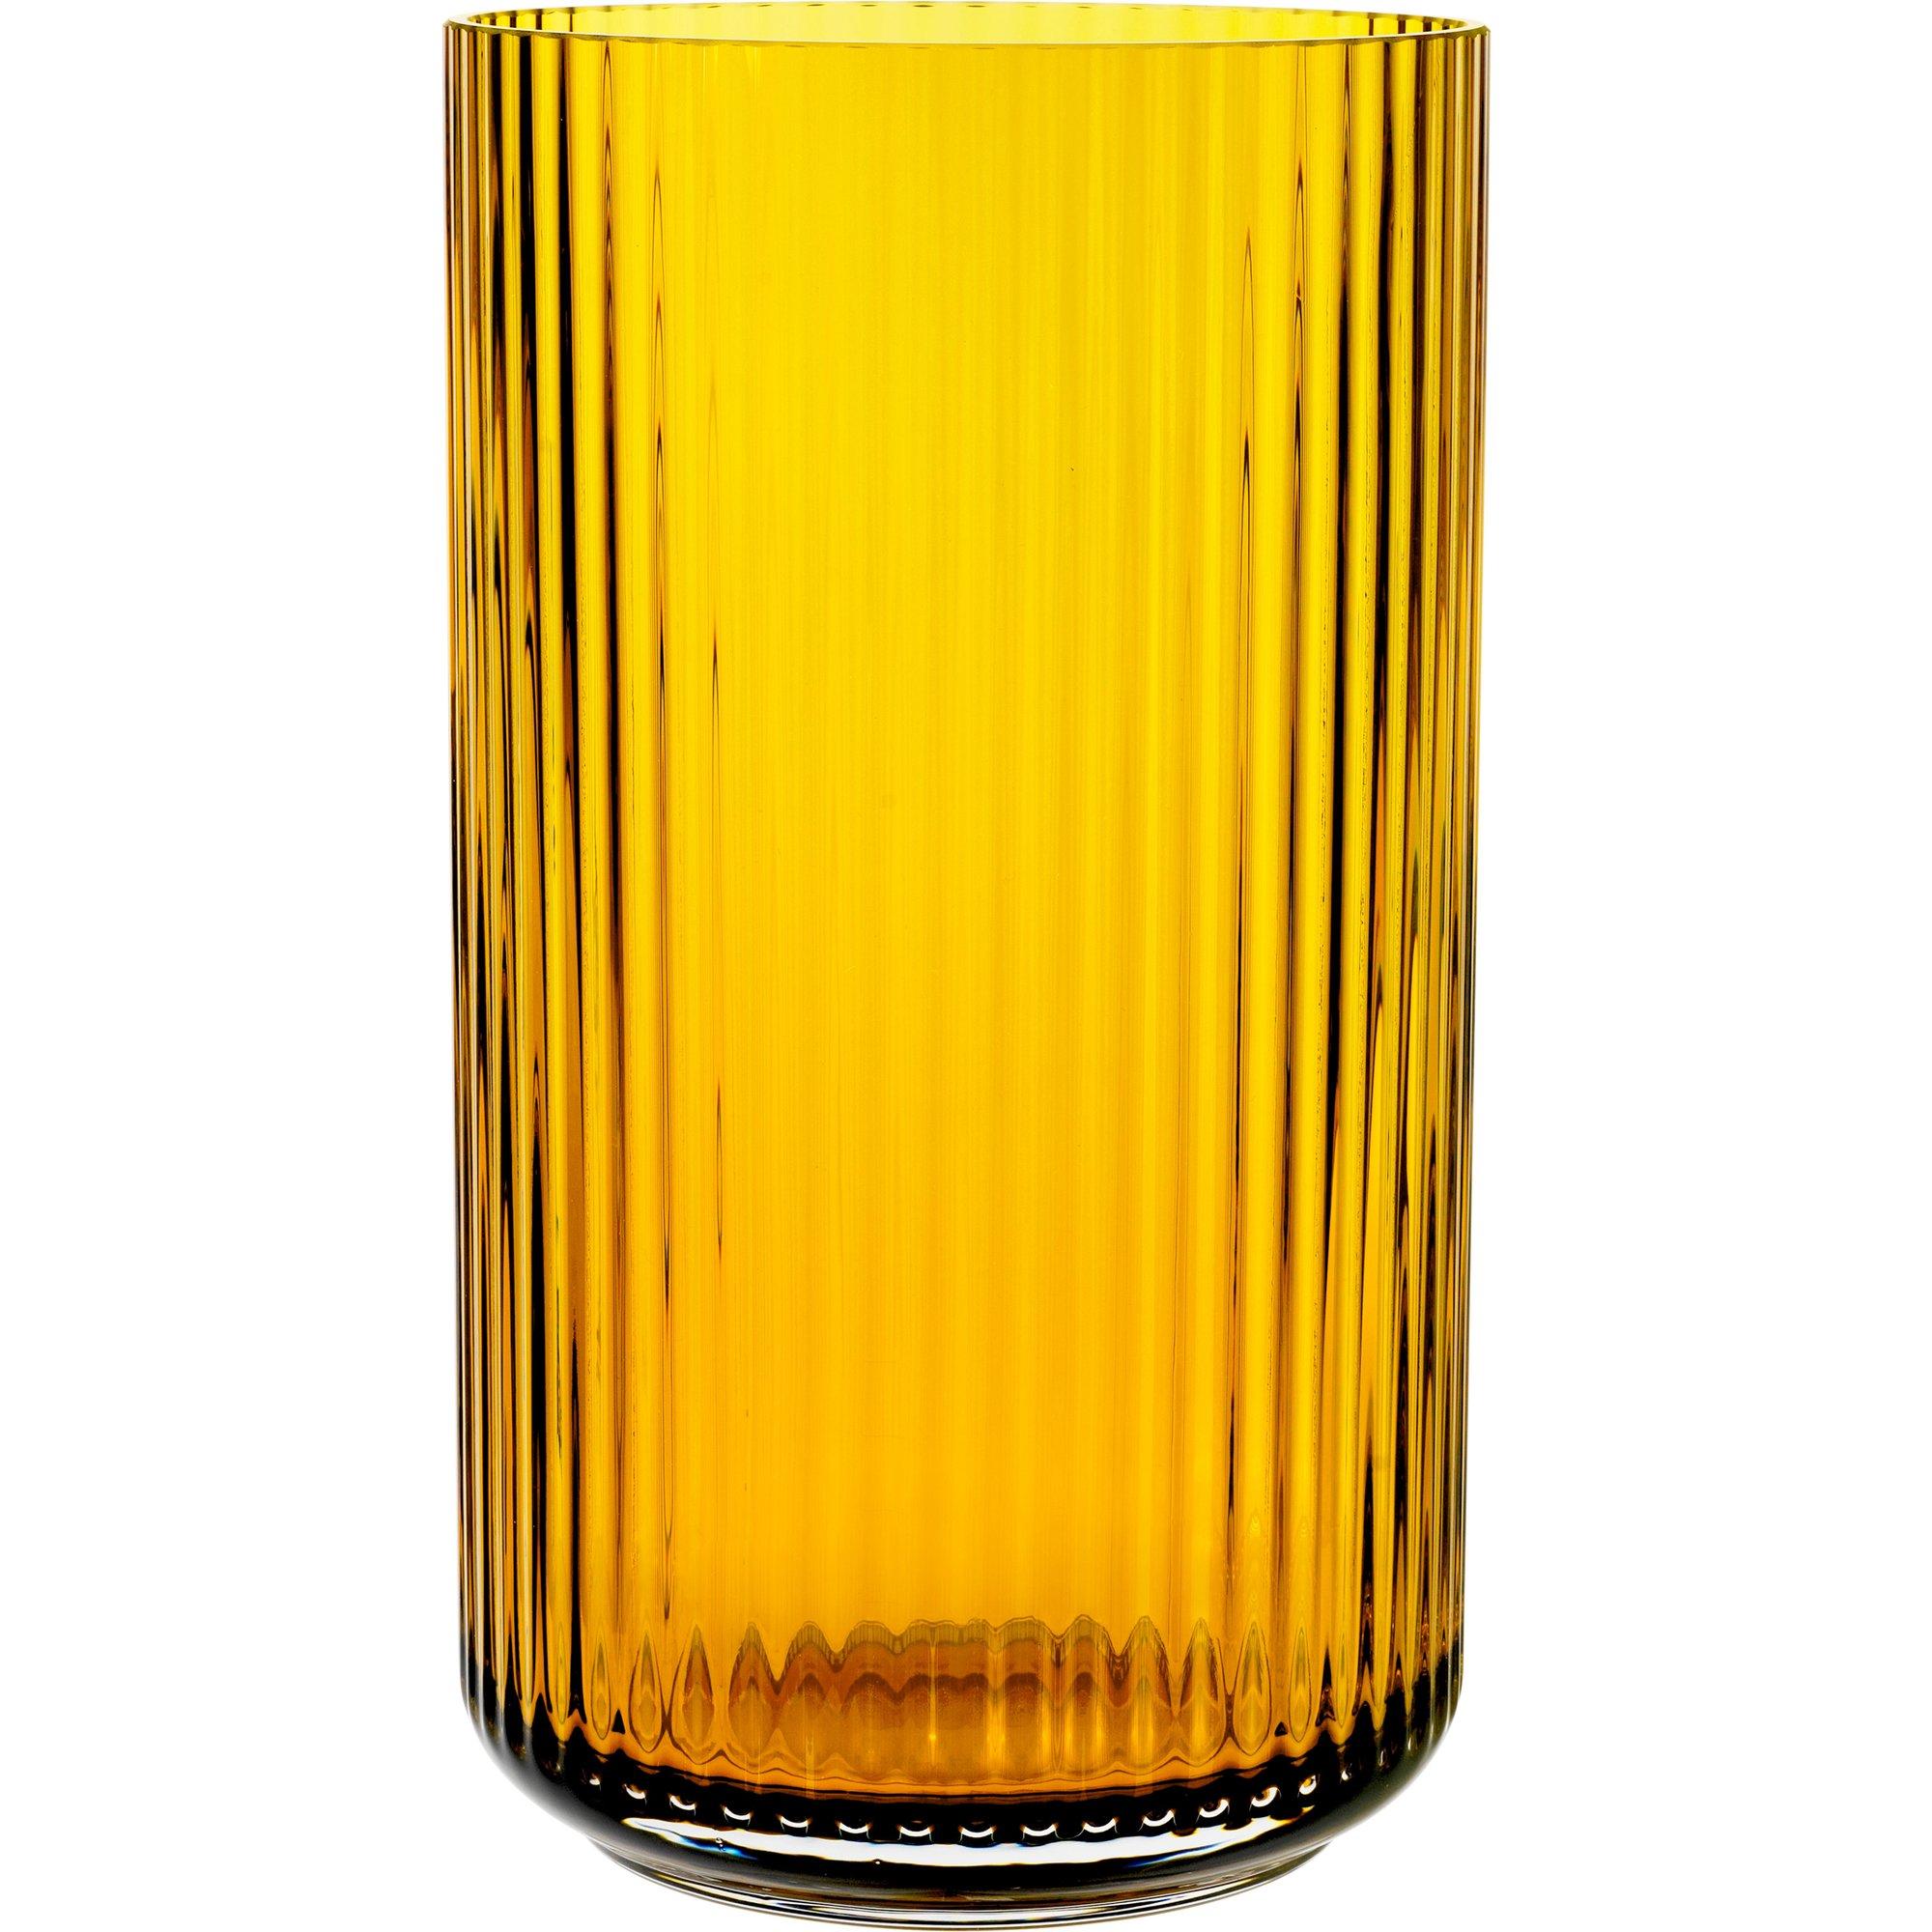 Lyngby Porcelæn Lyngbyvasen 25 cm. glas – amber